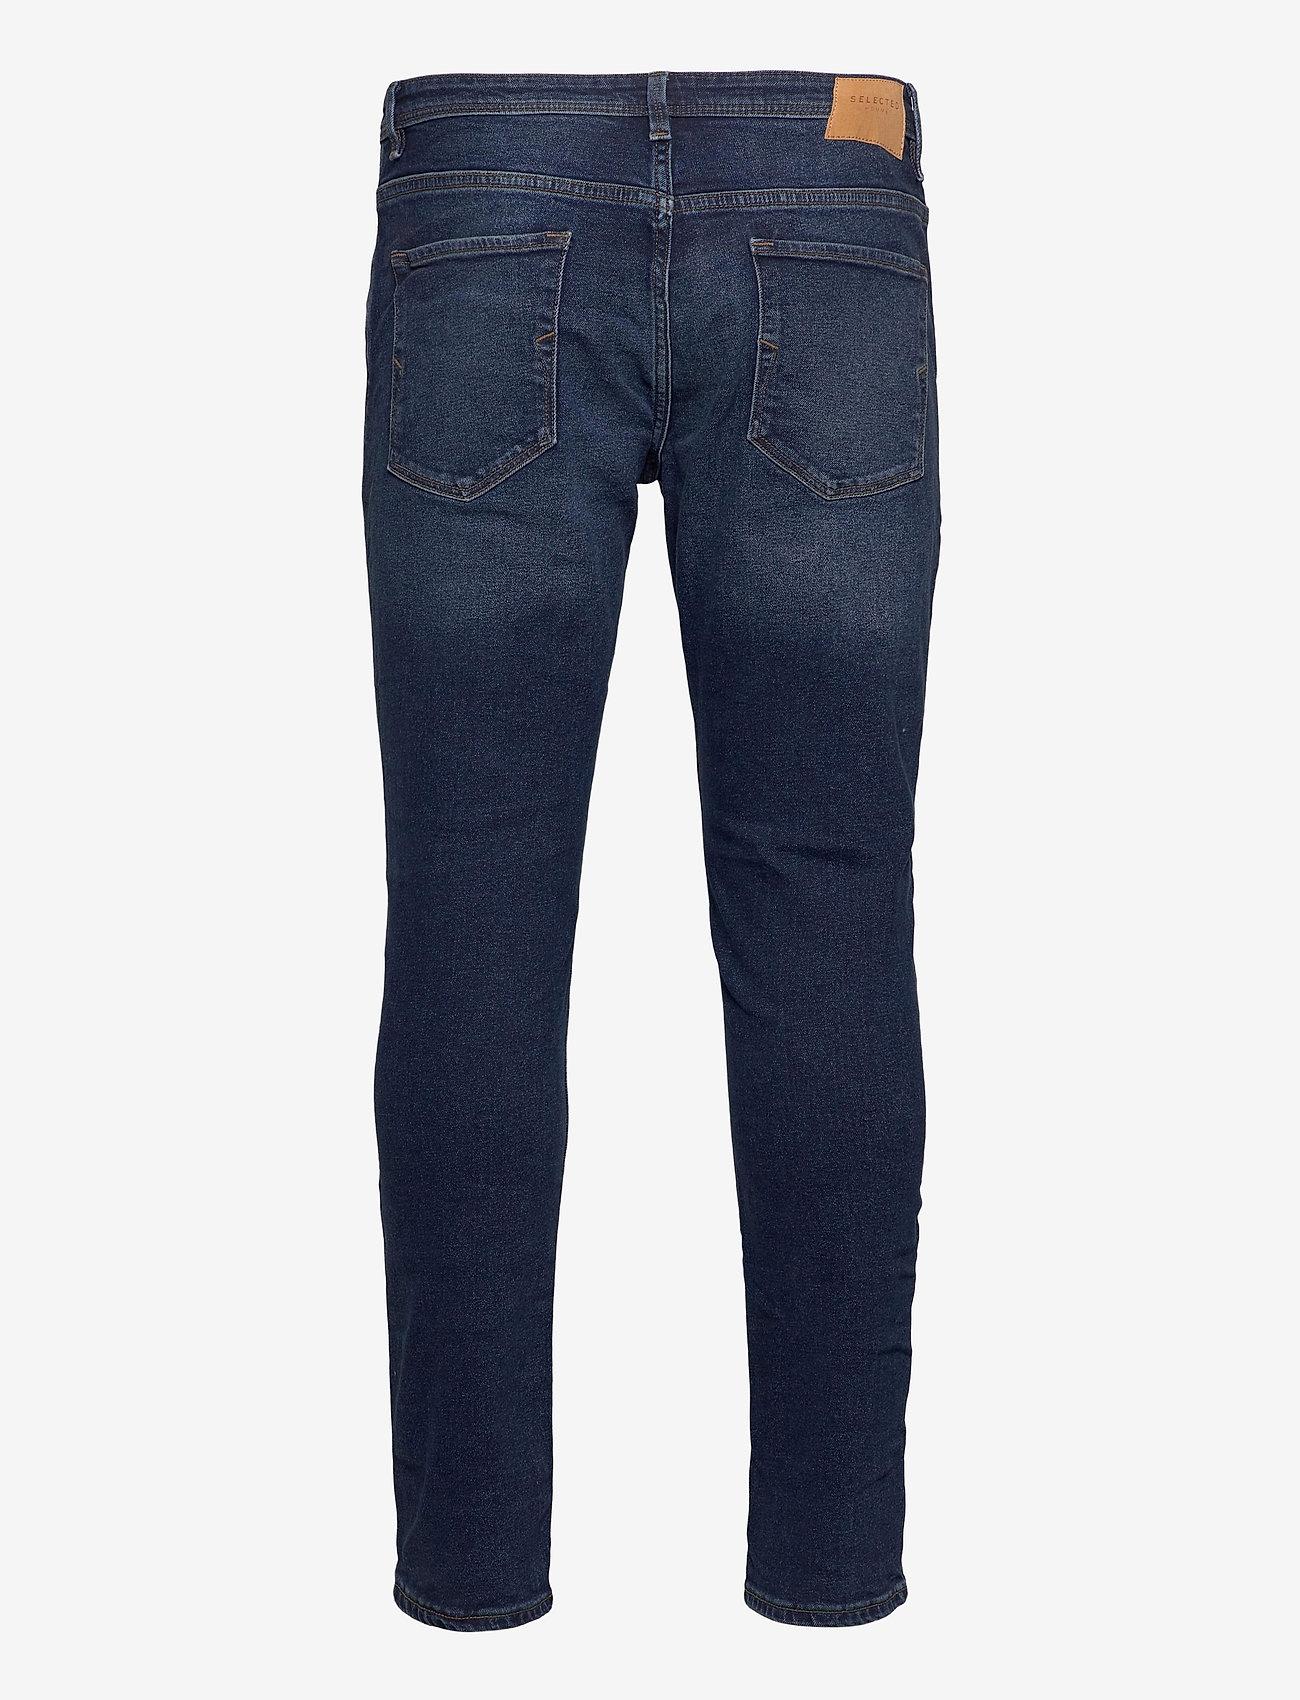 Selected Homme - SLHSLIM-LEON 3004 D.BLUE ST JEANS J - slim jeans - dark blue denim - 1